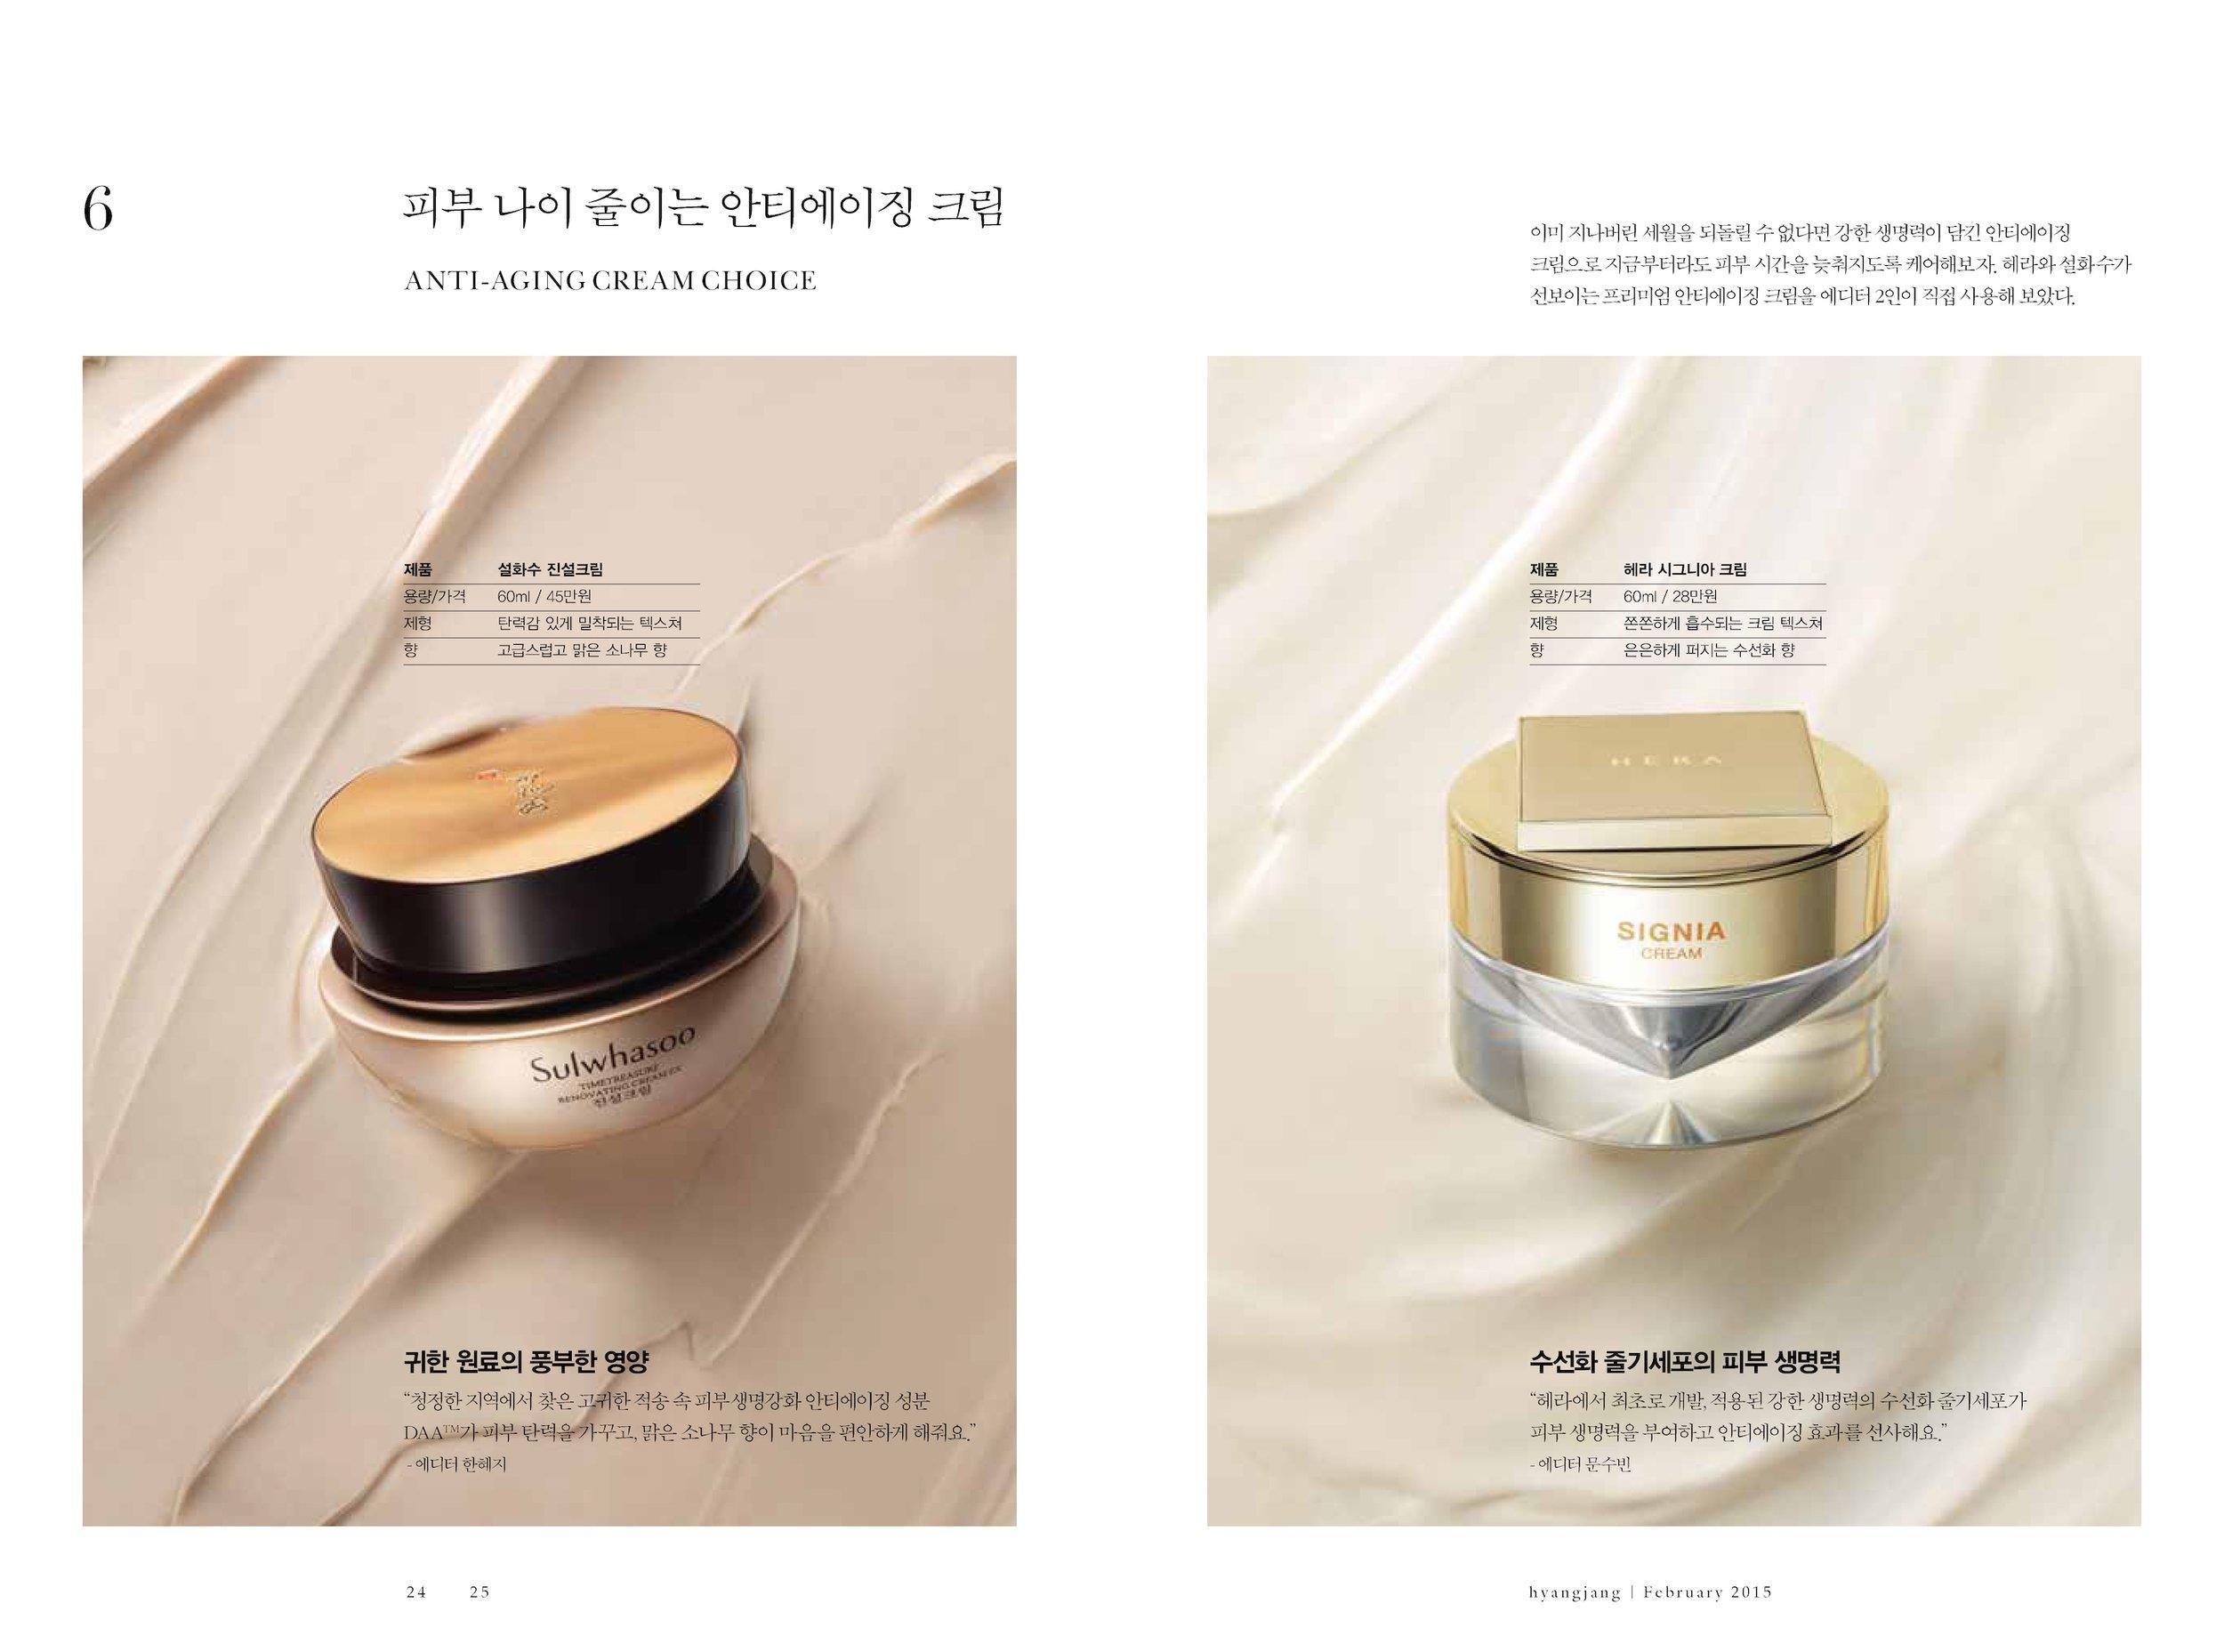 hyangjang-201502_페이지_13.jpeg